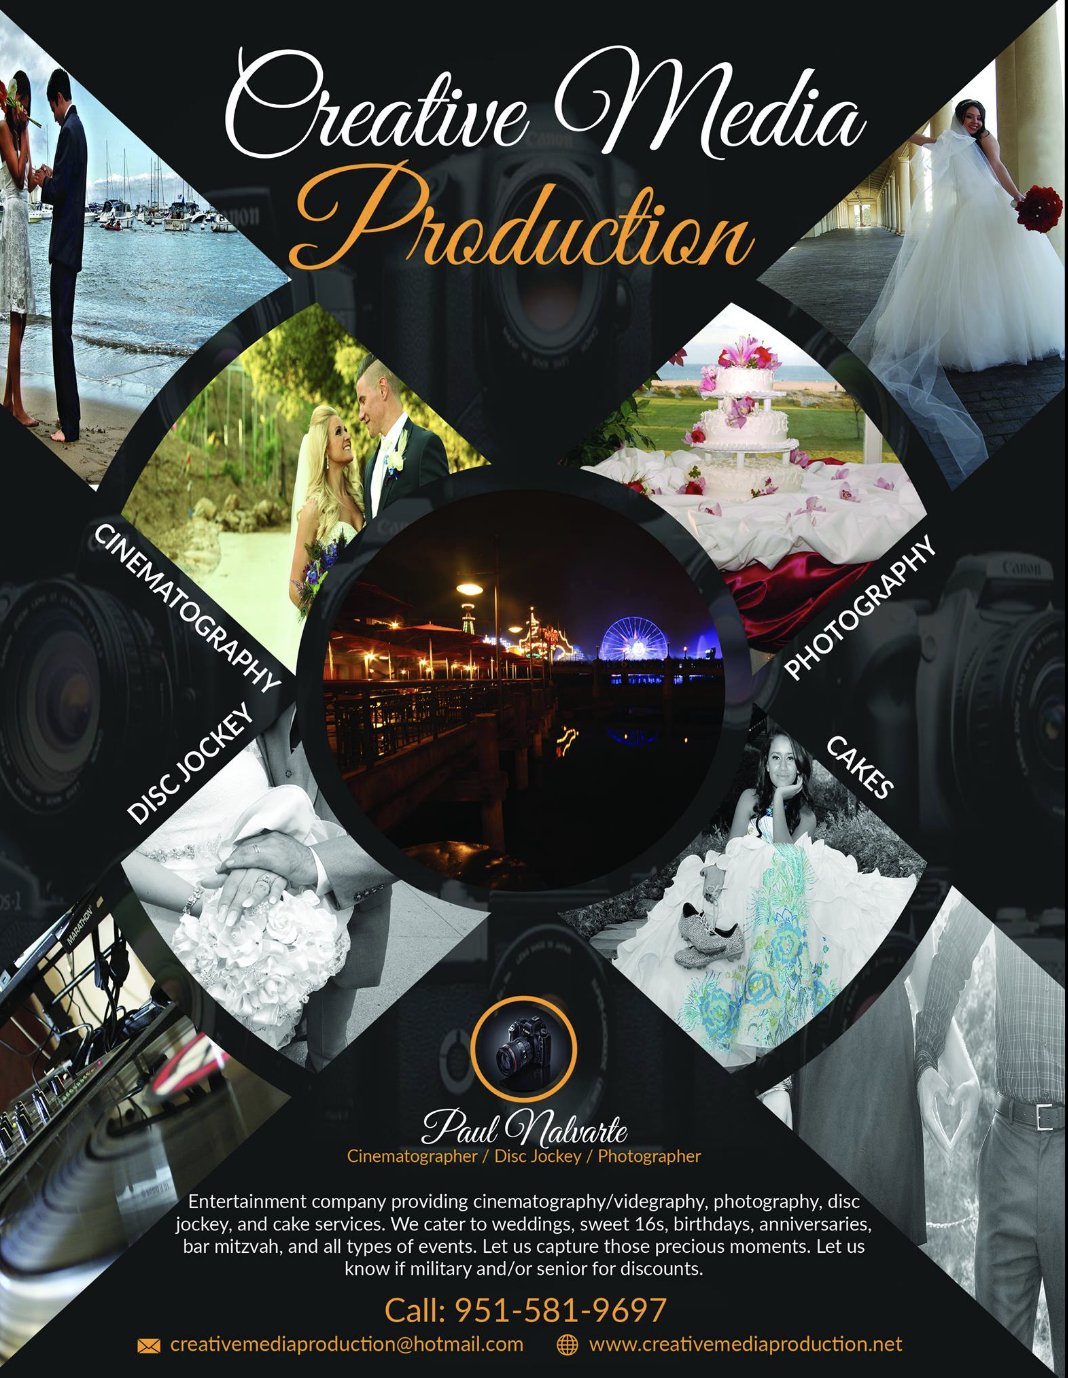 Creative Media Productions